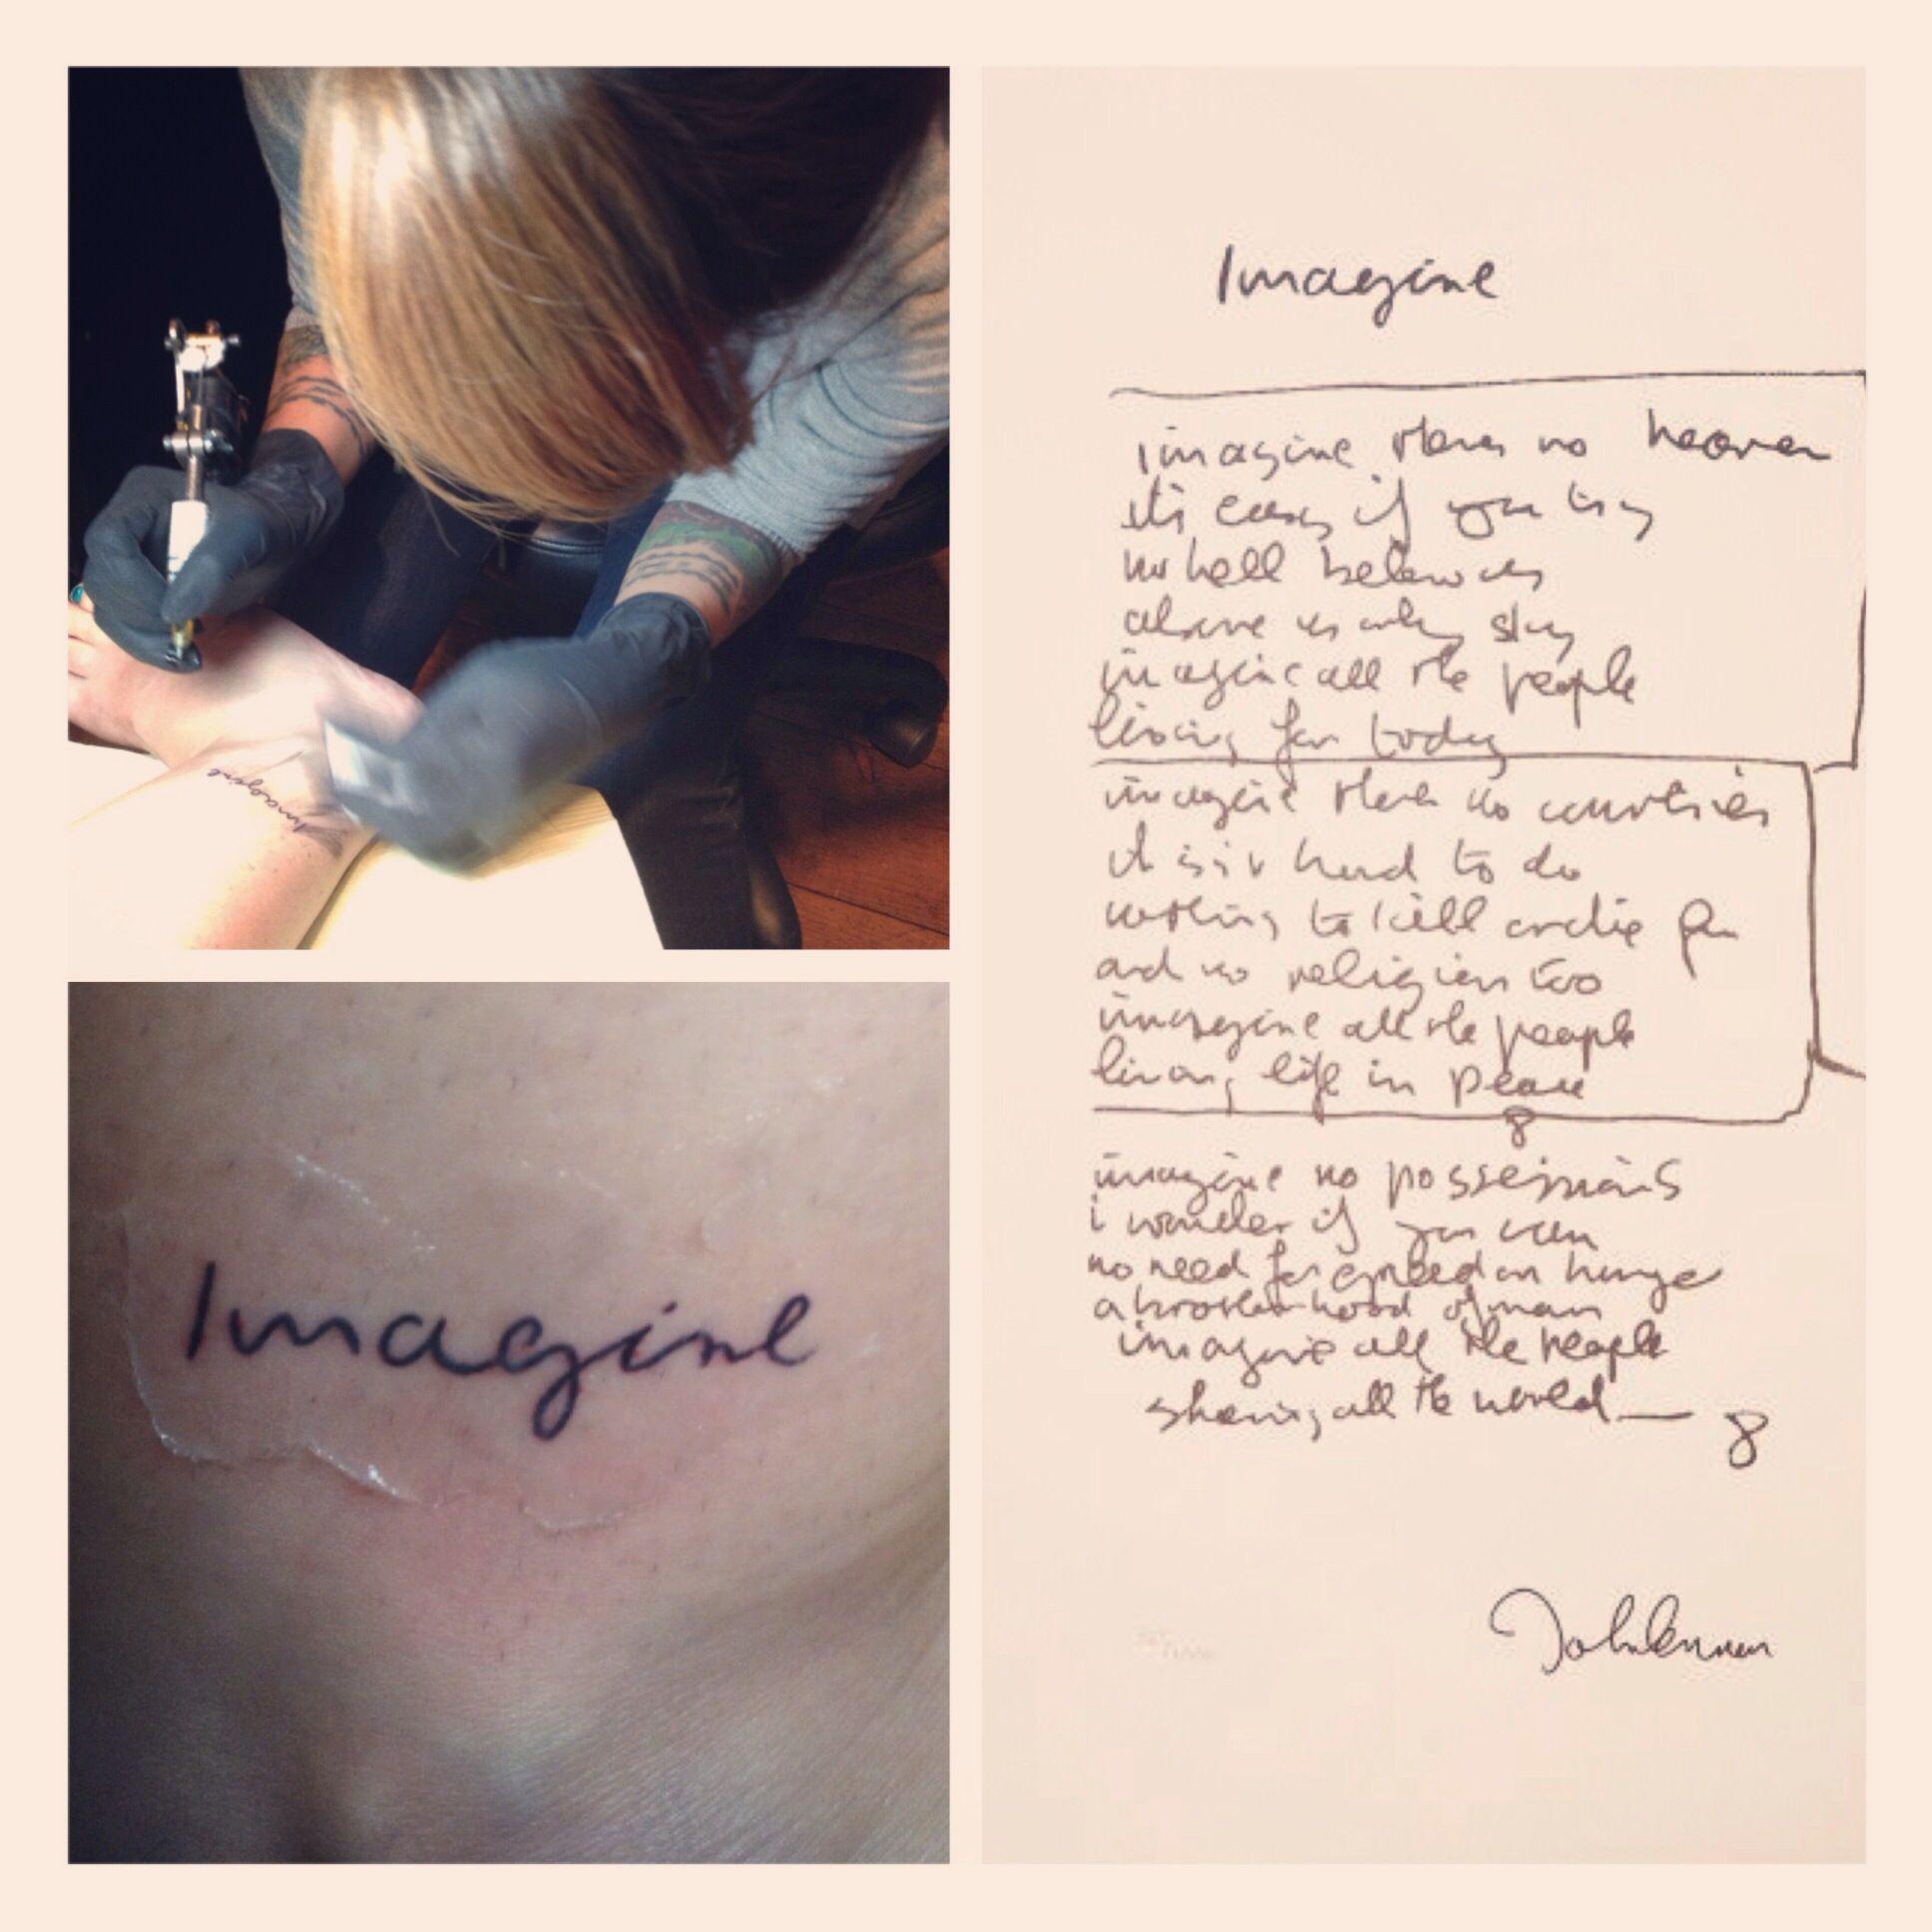 Imagine John Lennon Handwriting Tattoo Handwriting Tattoos Imagine John Lennon Tattoos